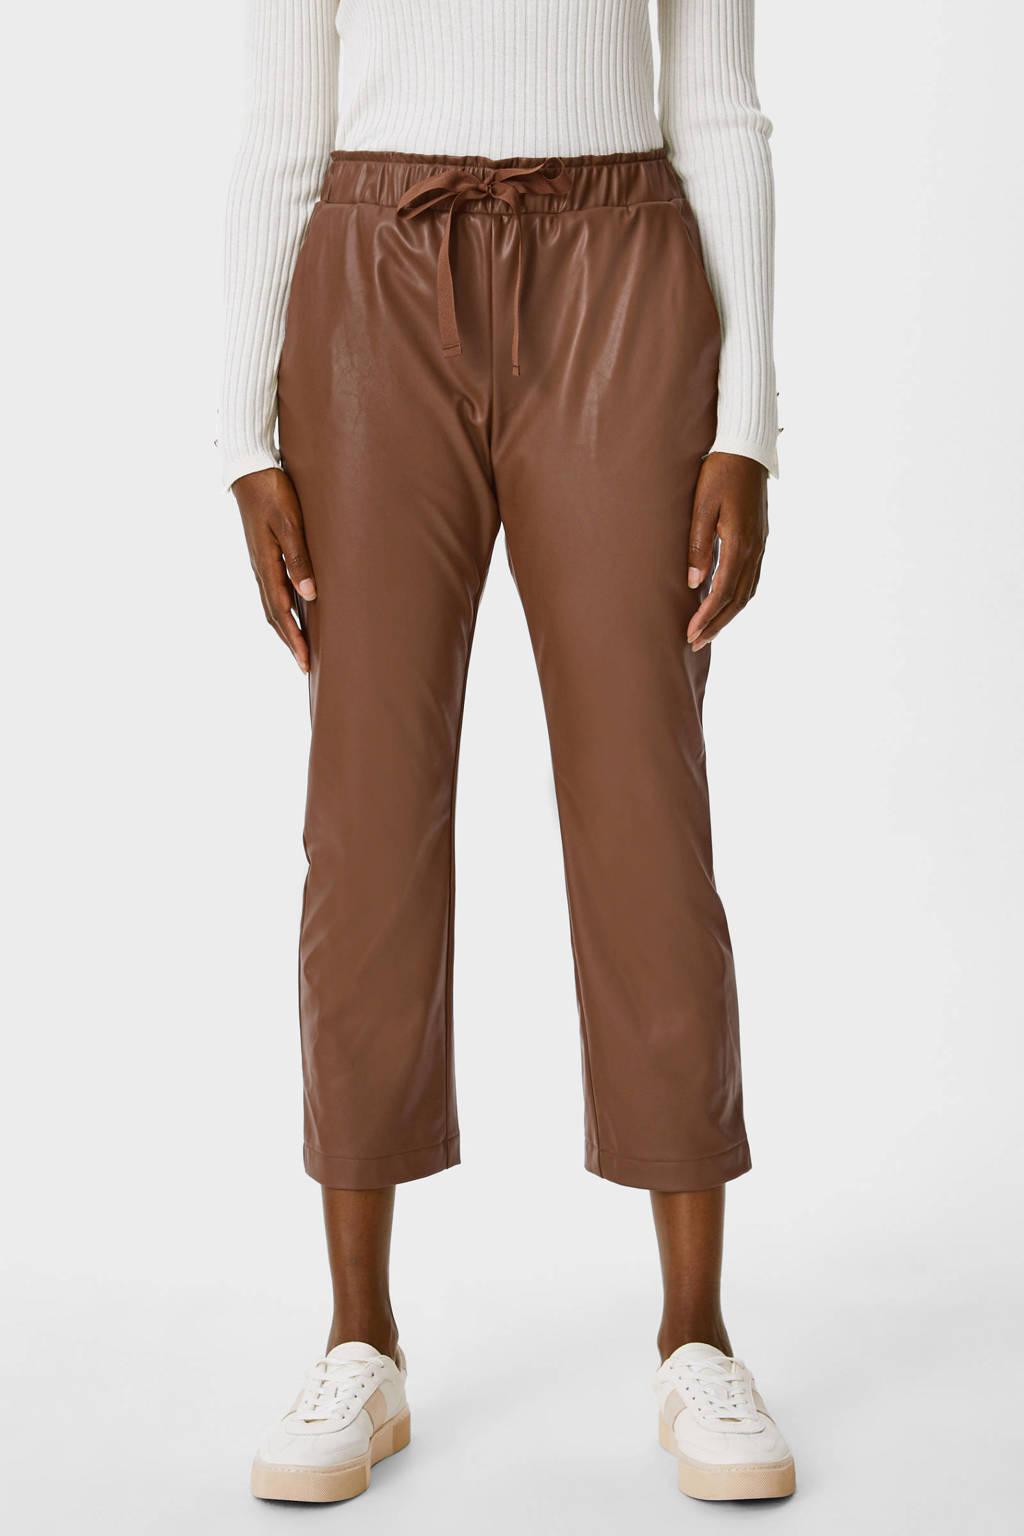 C&A YESSICA PREMIUM imitatieleren straight fit pantalon bruin, Bruin